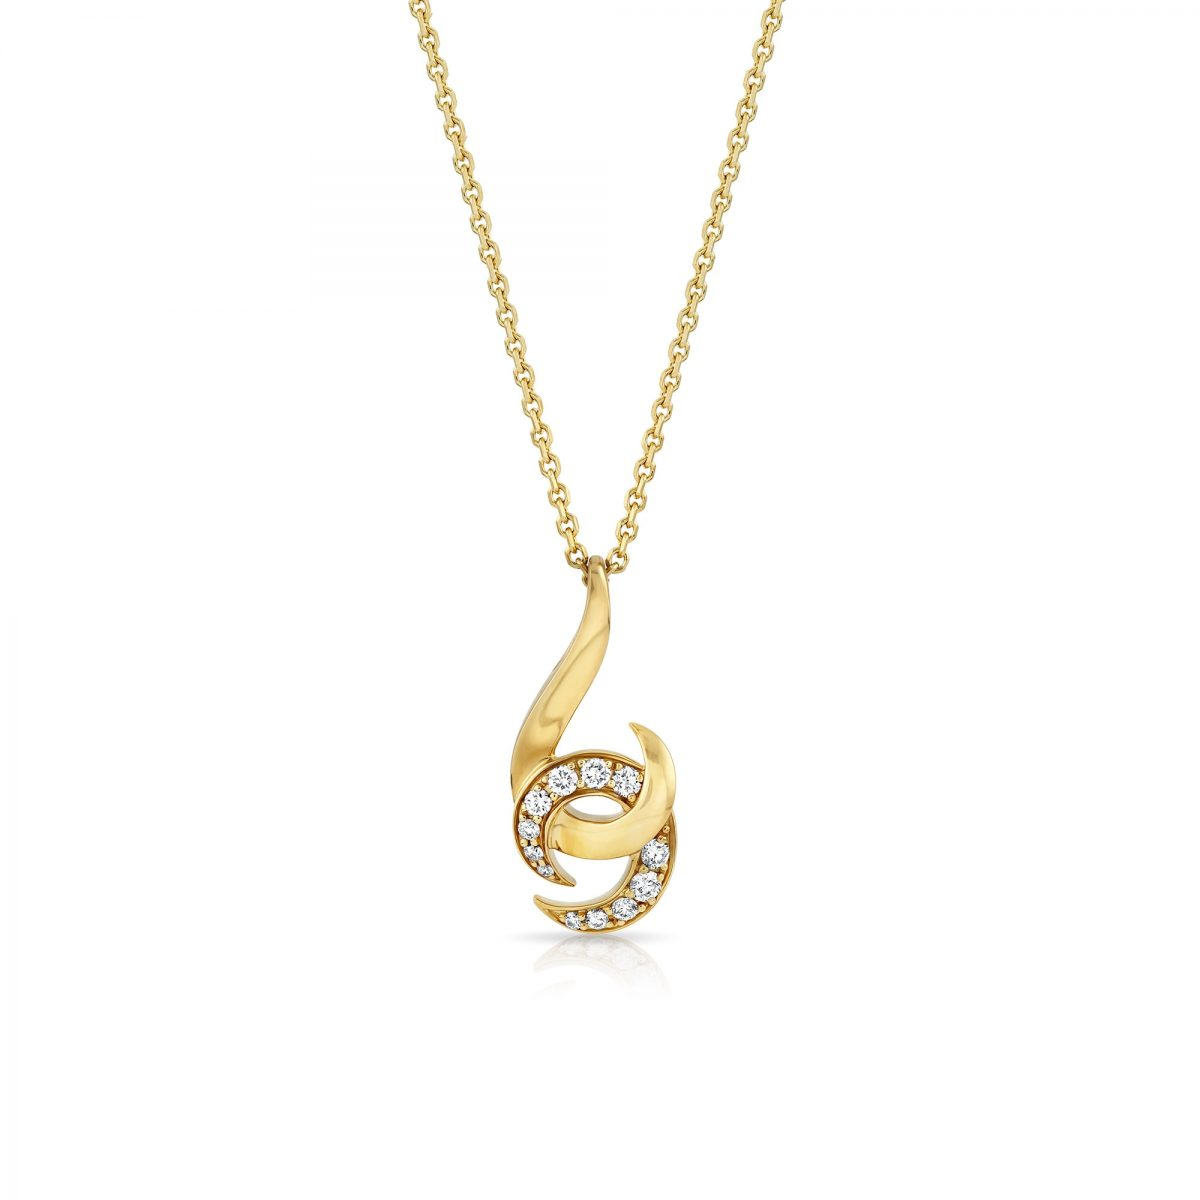 Hooked on You Yellow Gold Diamond Pendant